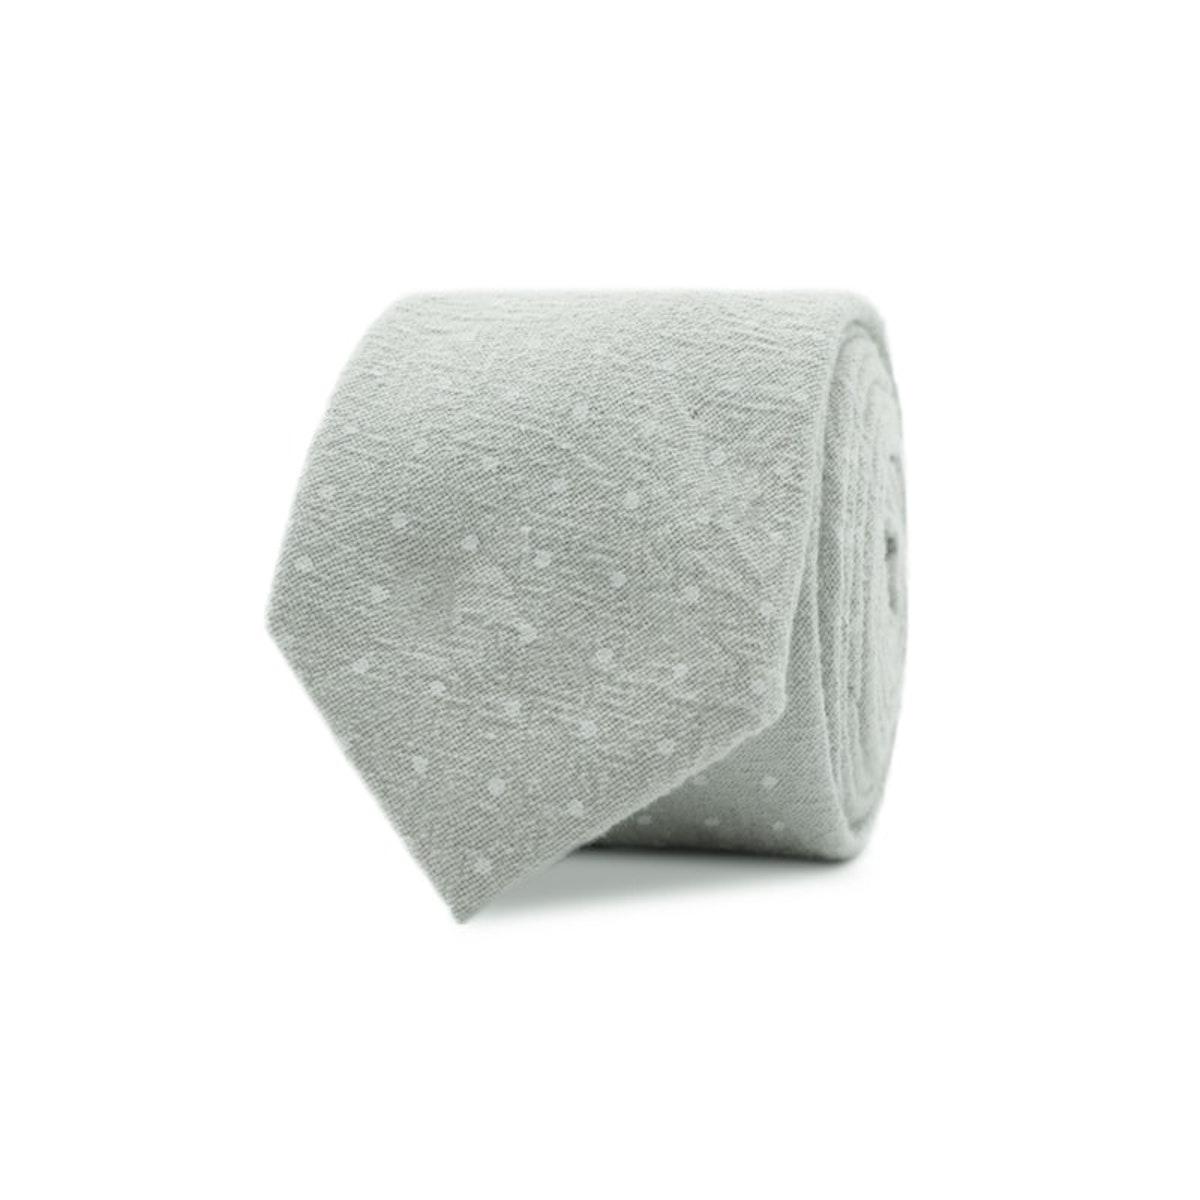 InStitchu Essentials Accessories Tie Maroubra Eucalypt-Grey Pastel Spotted Cotton Tie